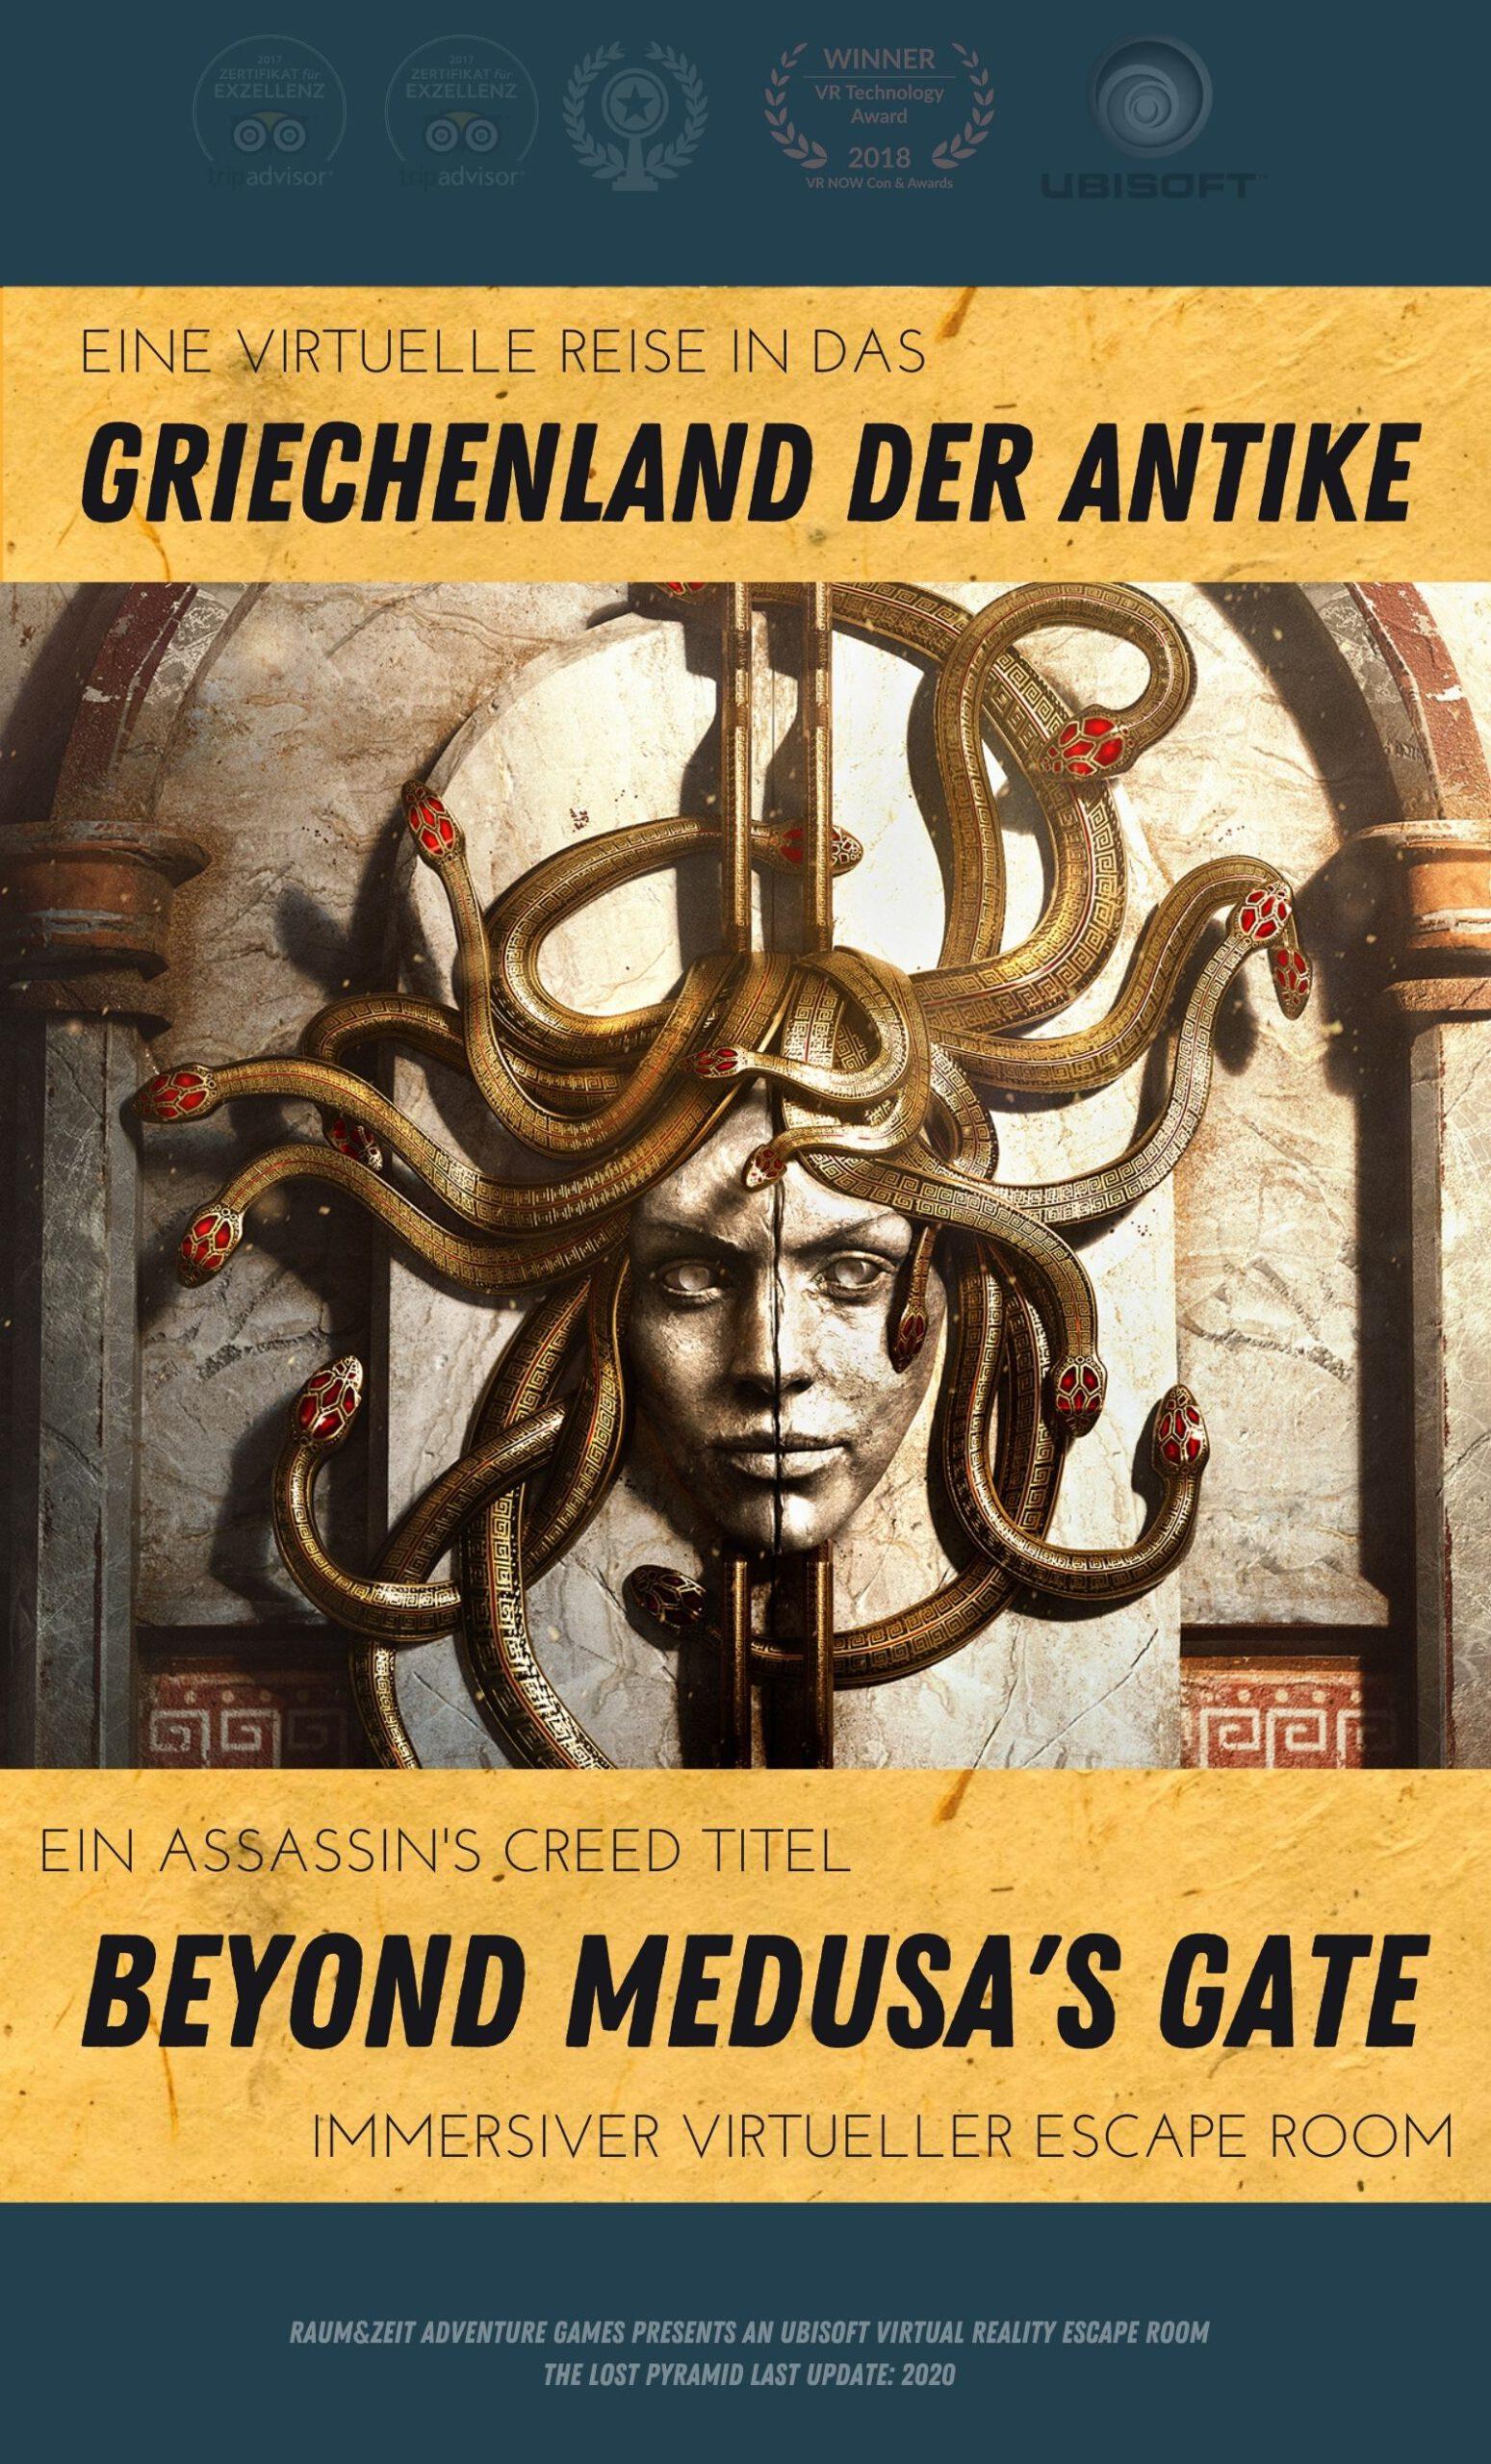 Beyond-Medusas-Gate-scaled.jpg